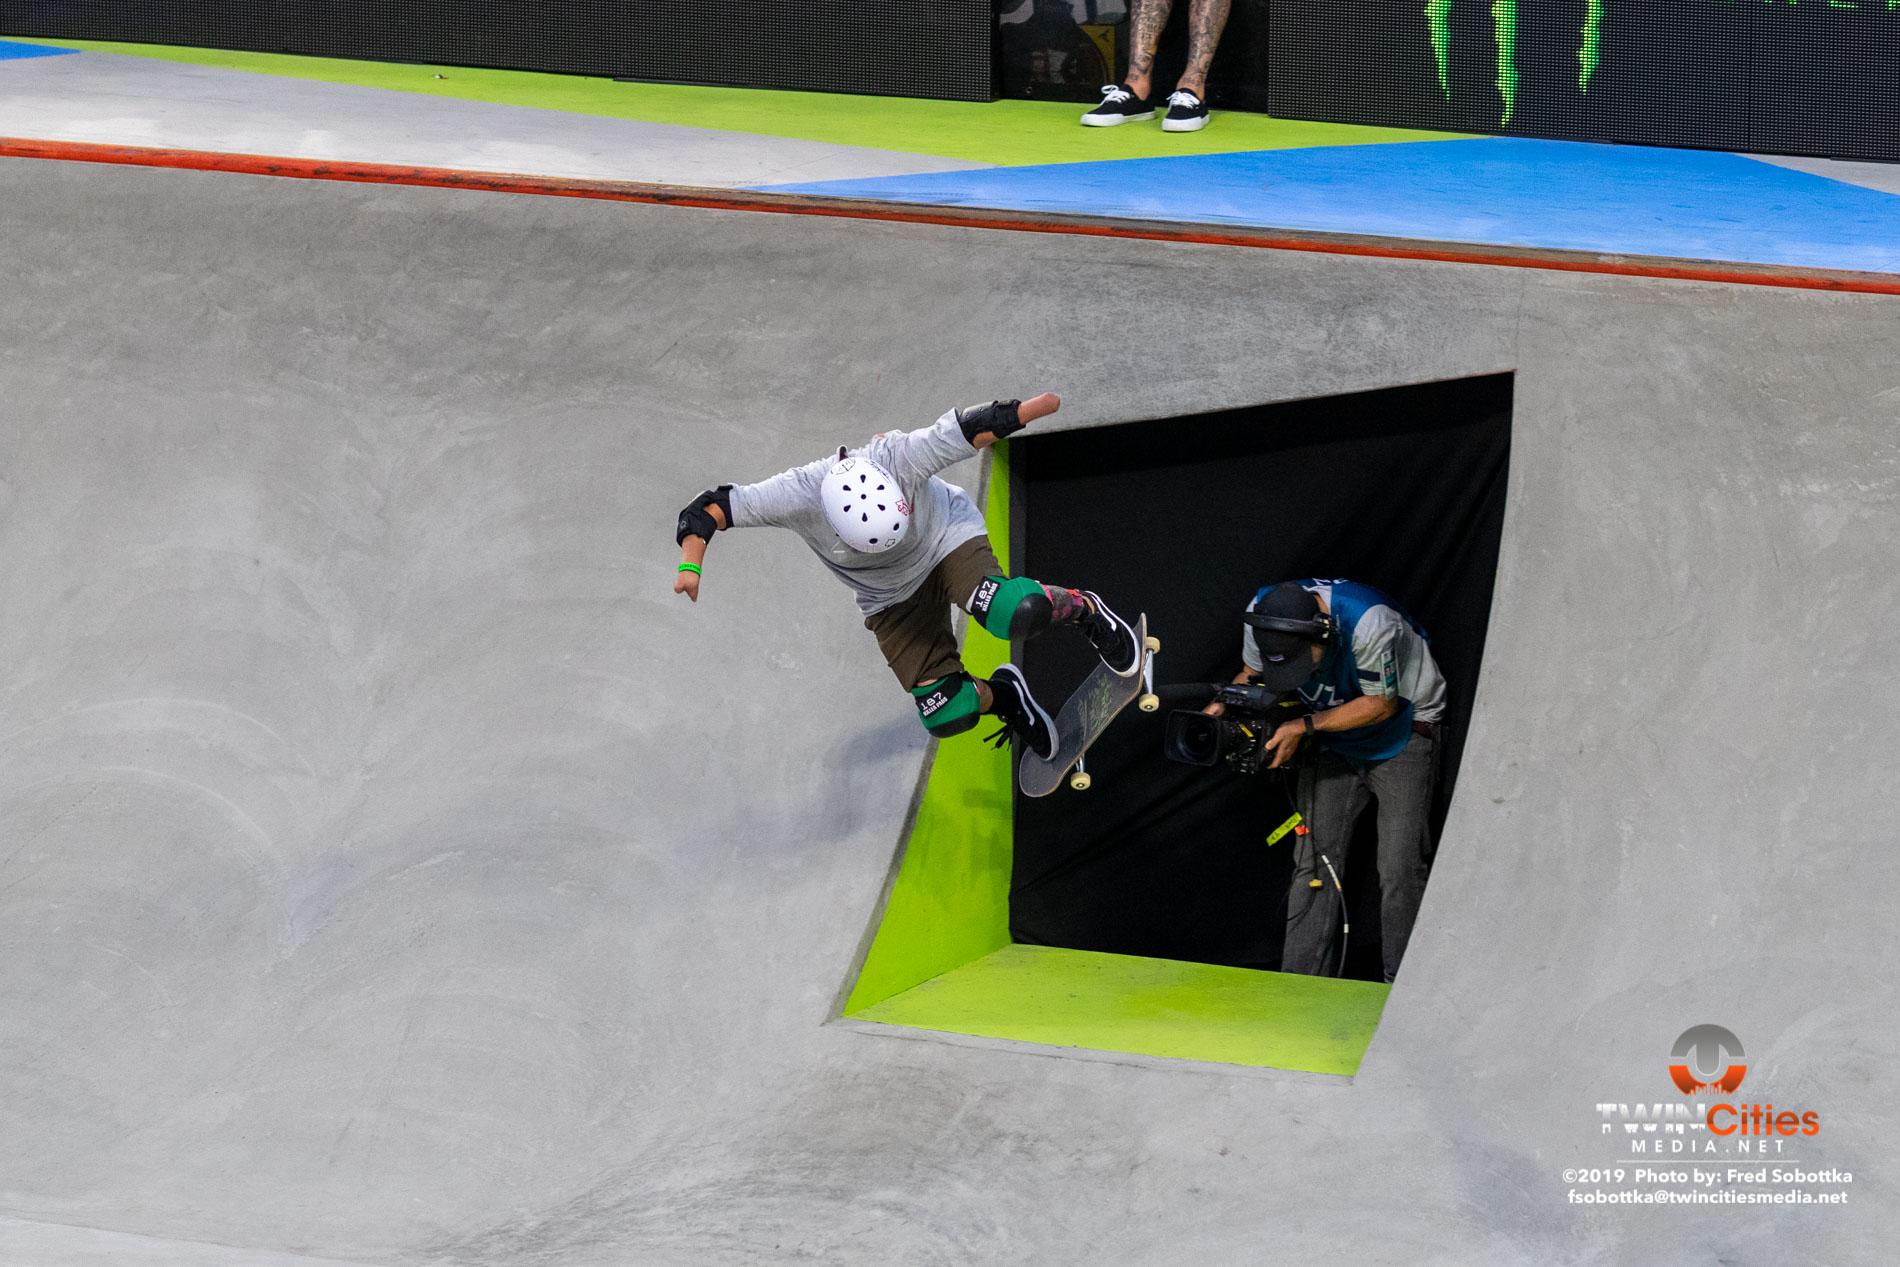 Adaptive-Skateboard-Park-08